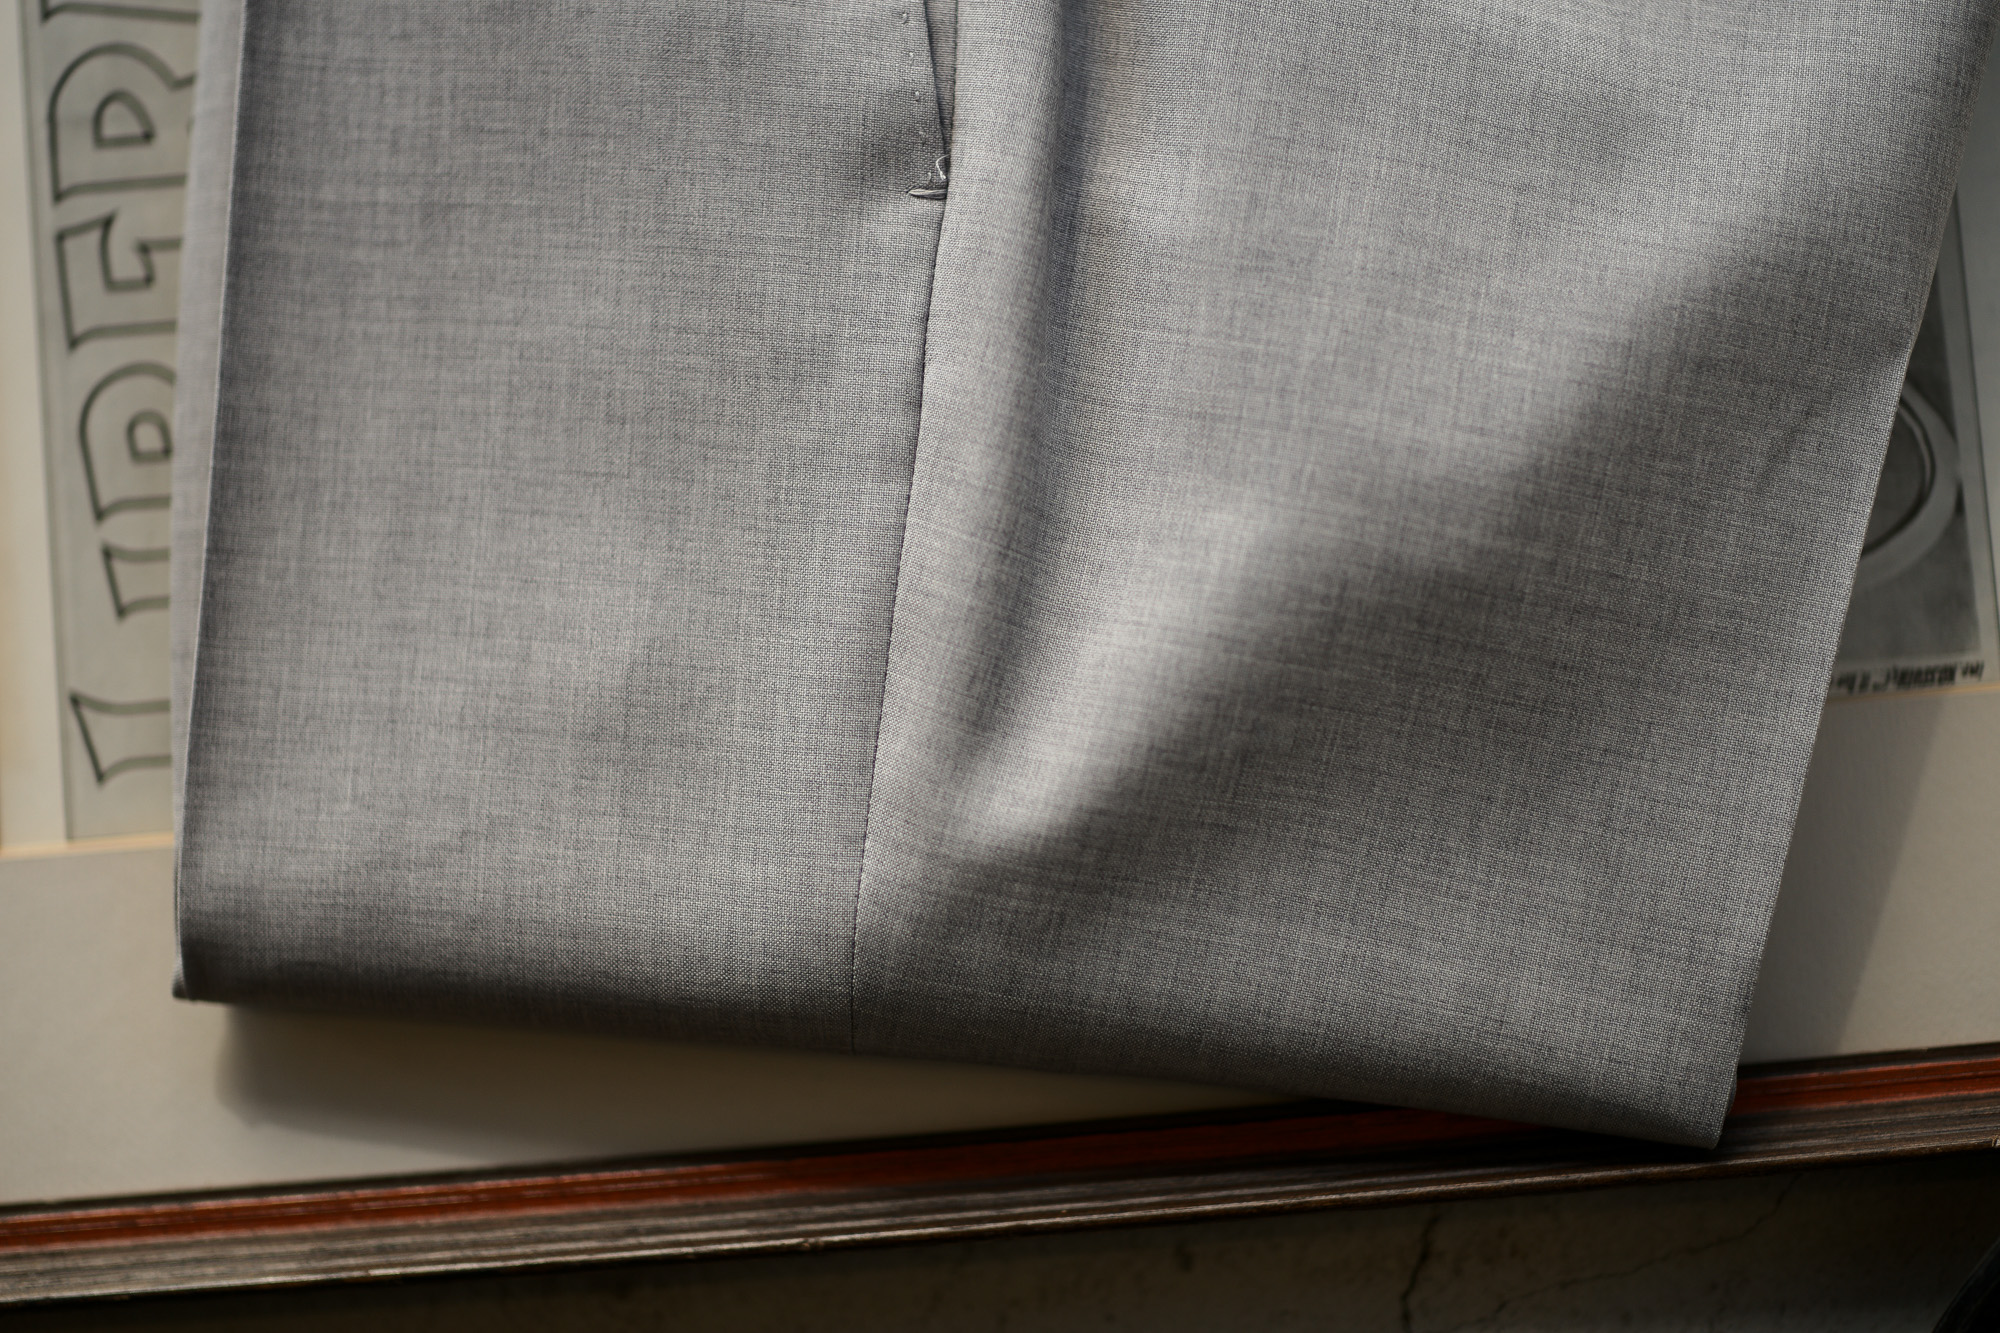 INCOTEX (インコテックス) N35 SLIM FIT (1NT035) SUPER 100'S YARN DYED TROPICAL トロピカルウール サマーウール スラックス LIGHT GRAY (ライトグレー・901) 2019 春夏新作 愛知 名古屋 altoediritto アルトエデリット